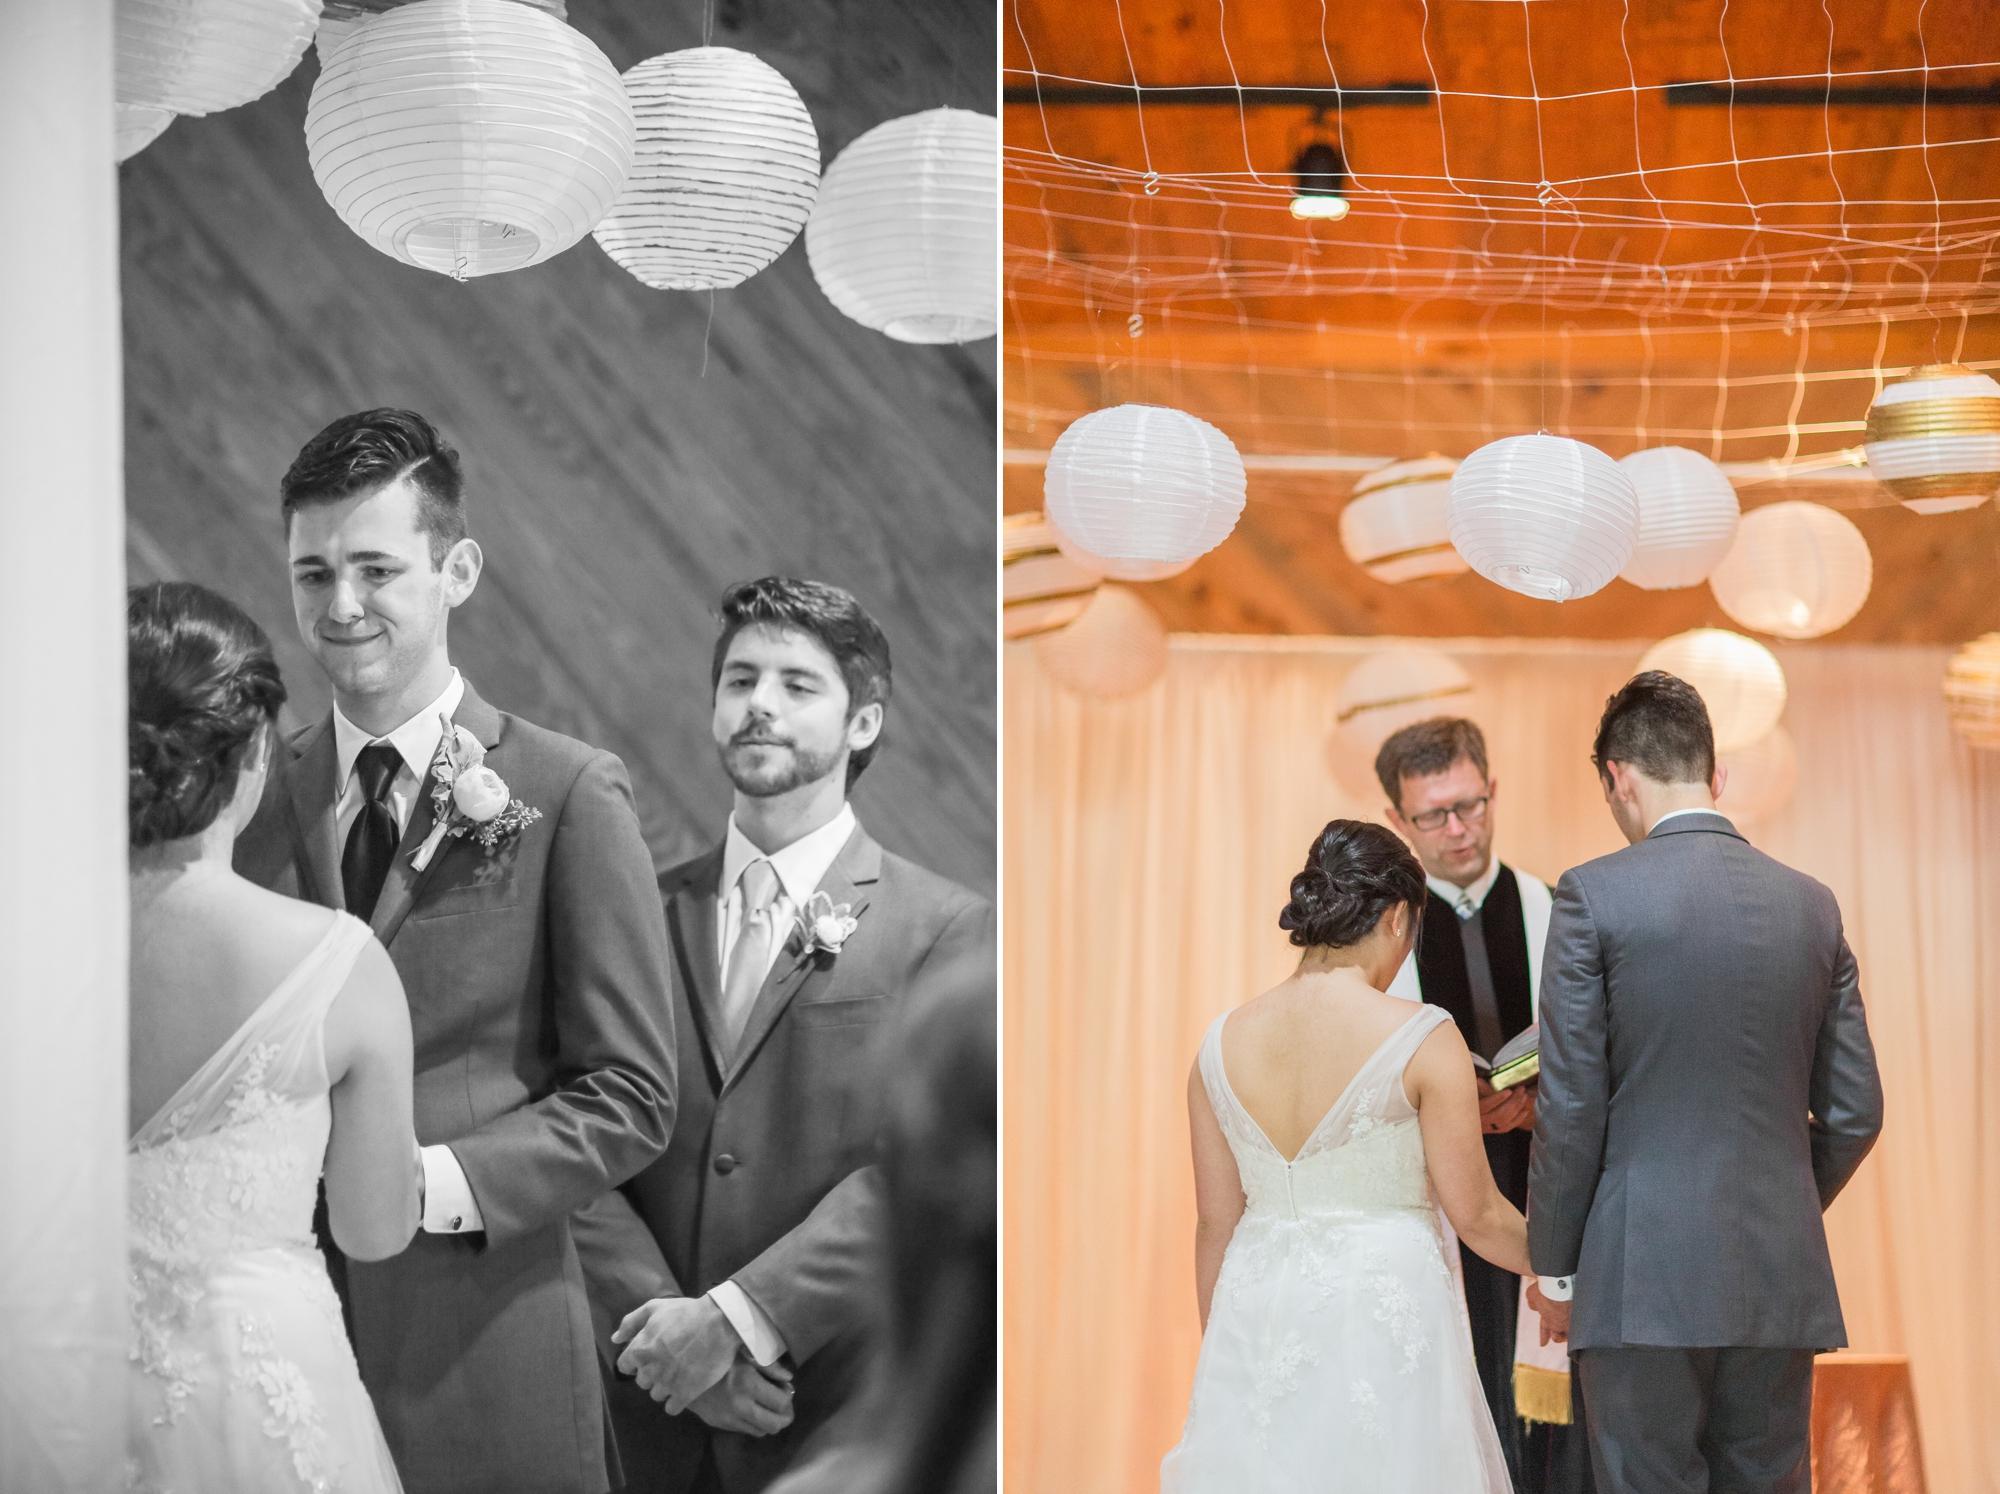 giles wedding blog 24.jpg